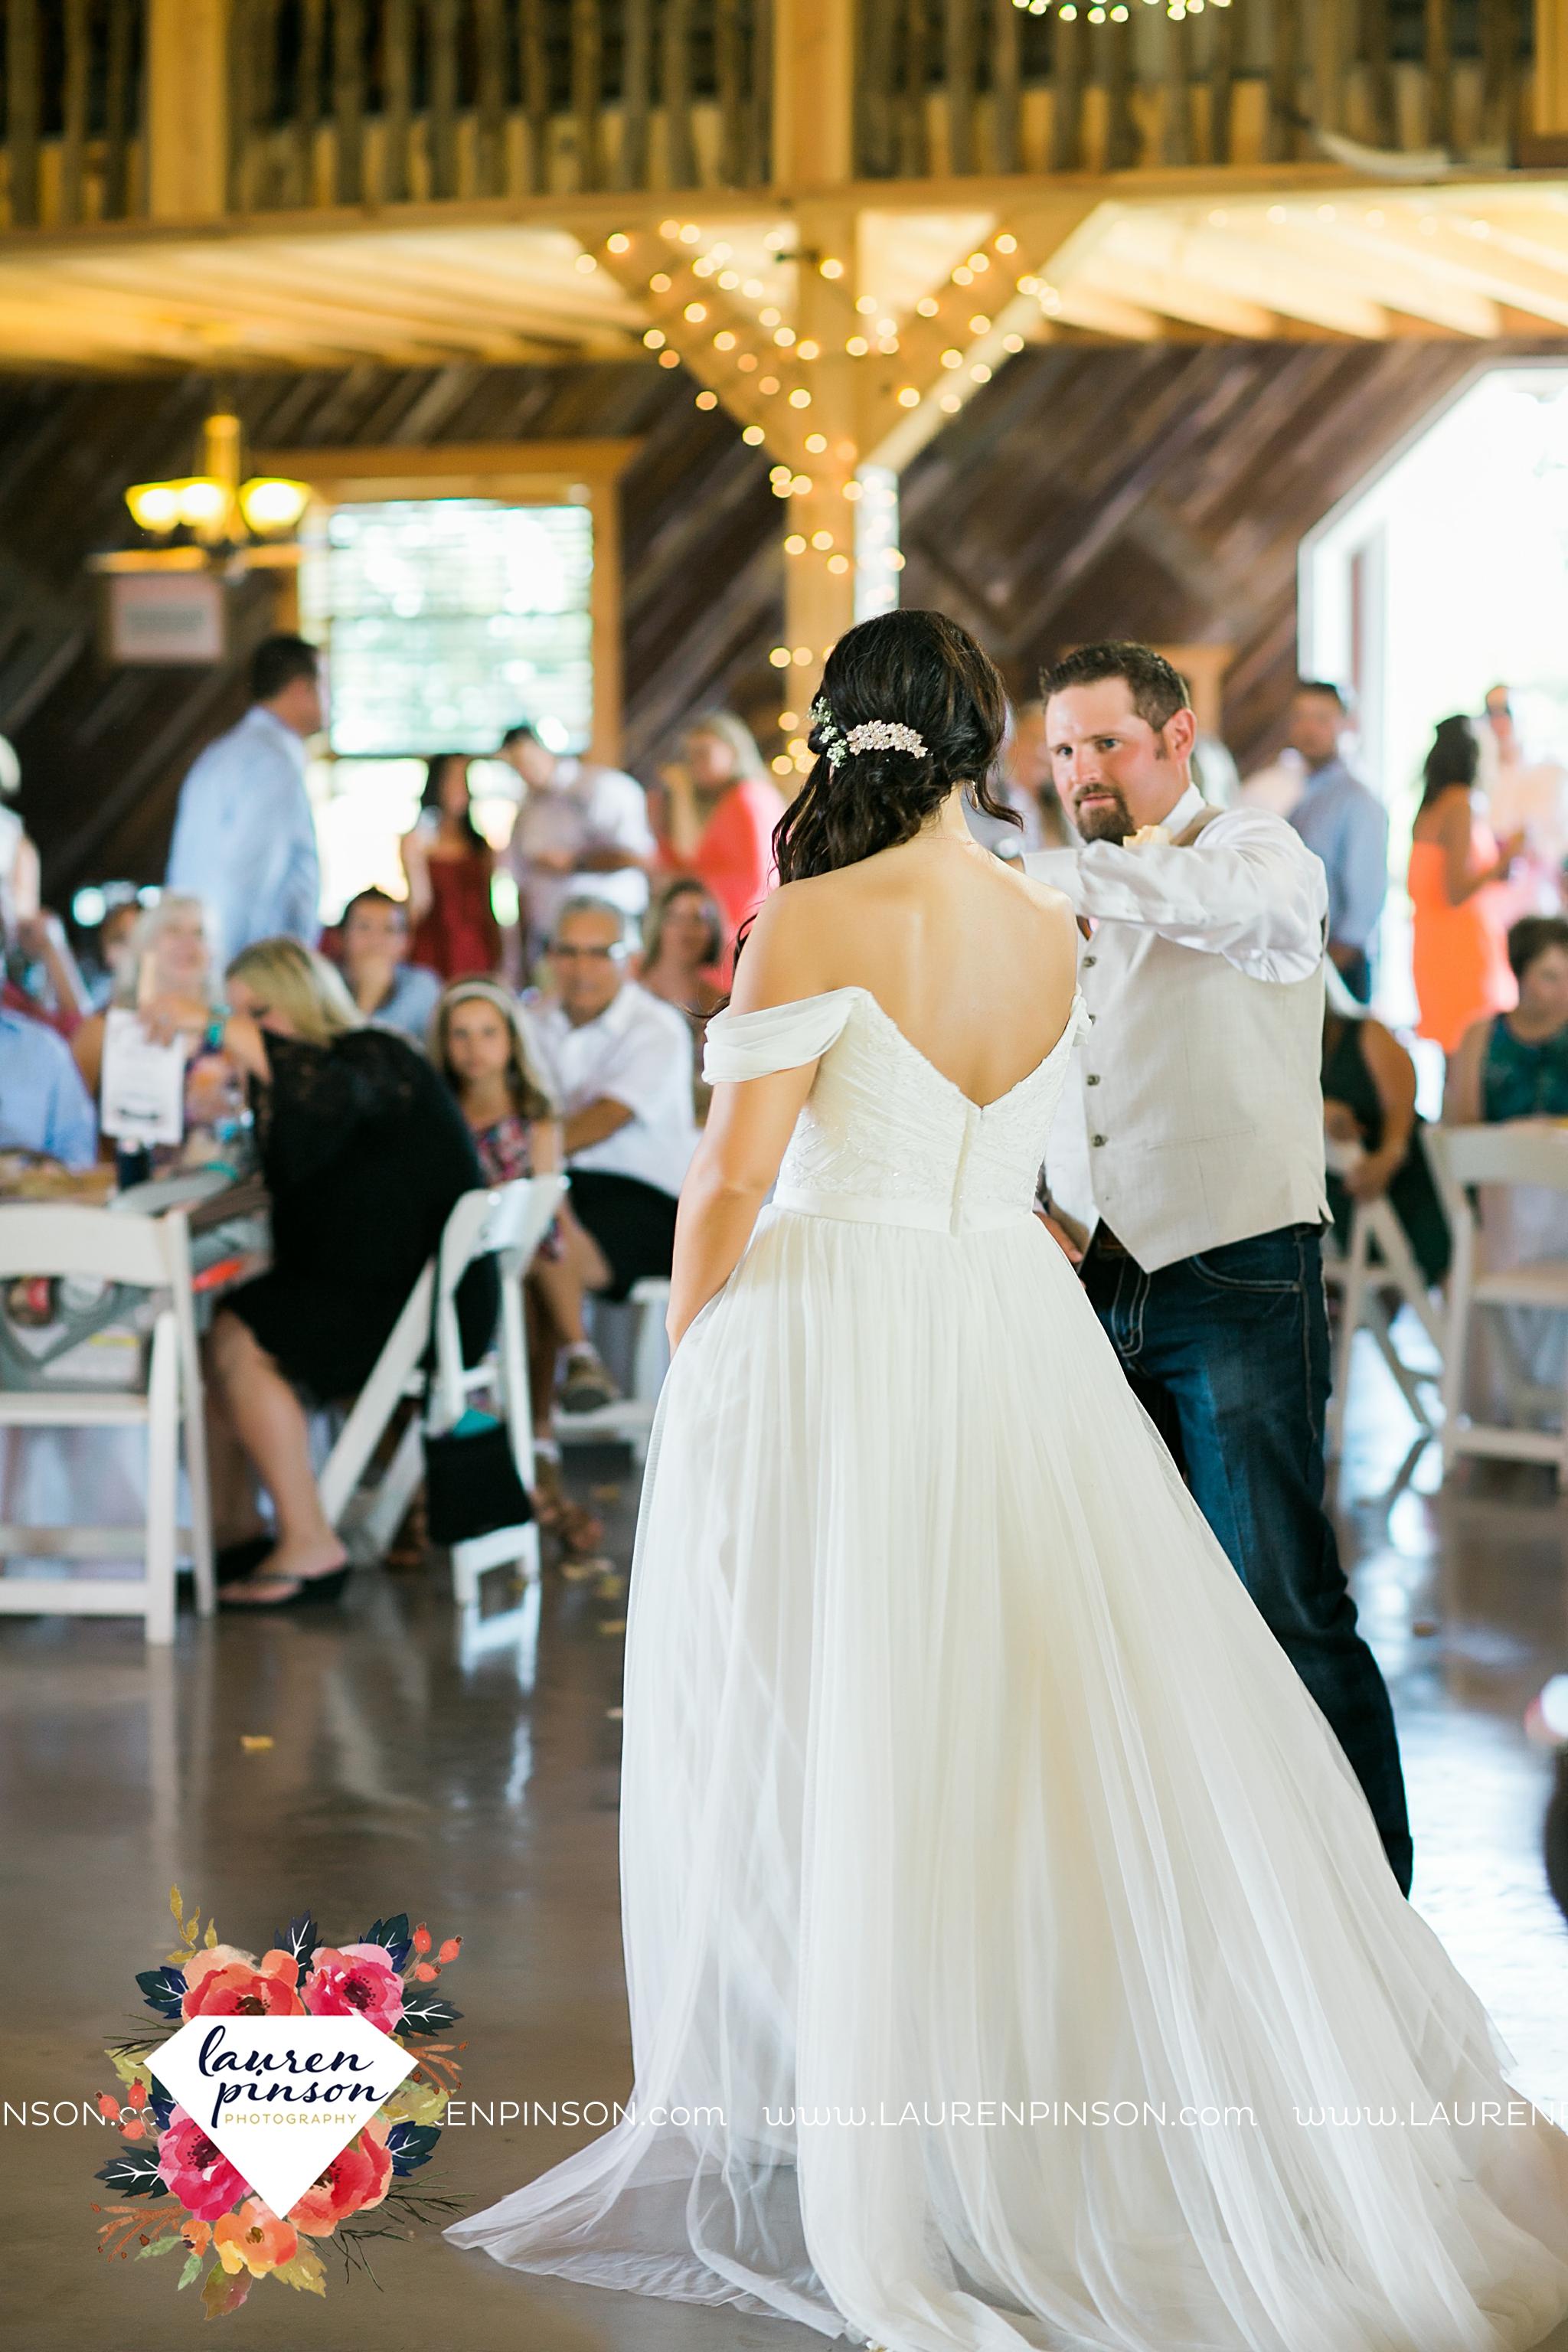 jones-barn-willow-creek-ranch-wedding-in-cleburne-texas-fort-worth-dfw-wichita-falls-wedding-photography_3253.jpg